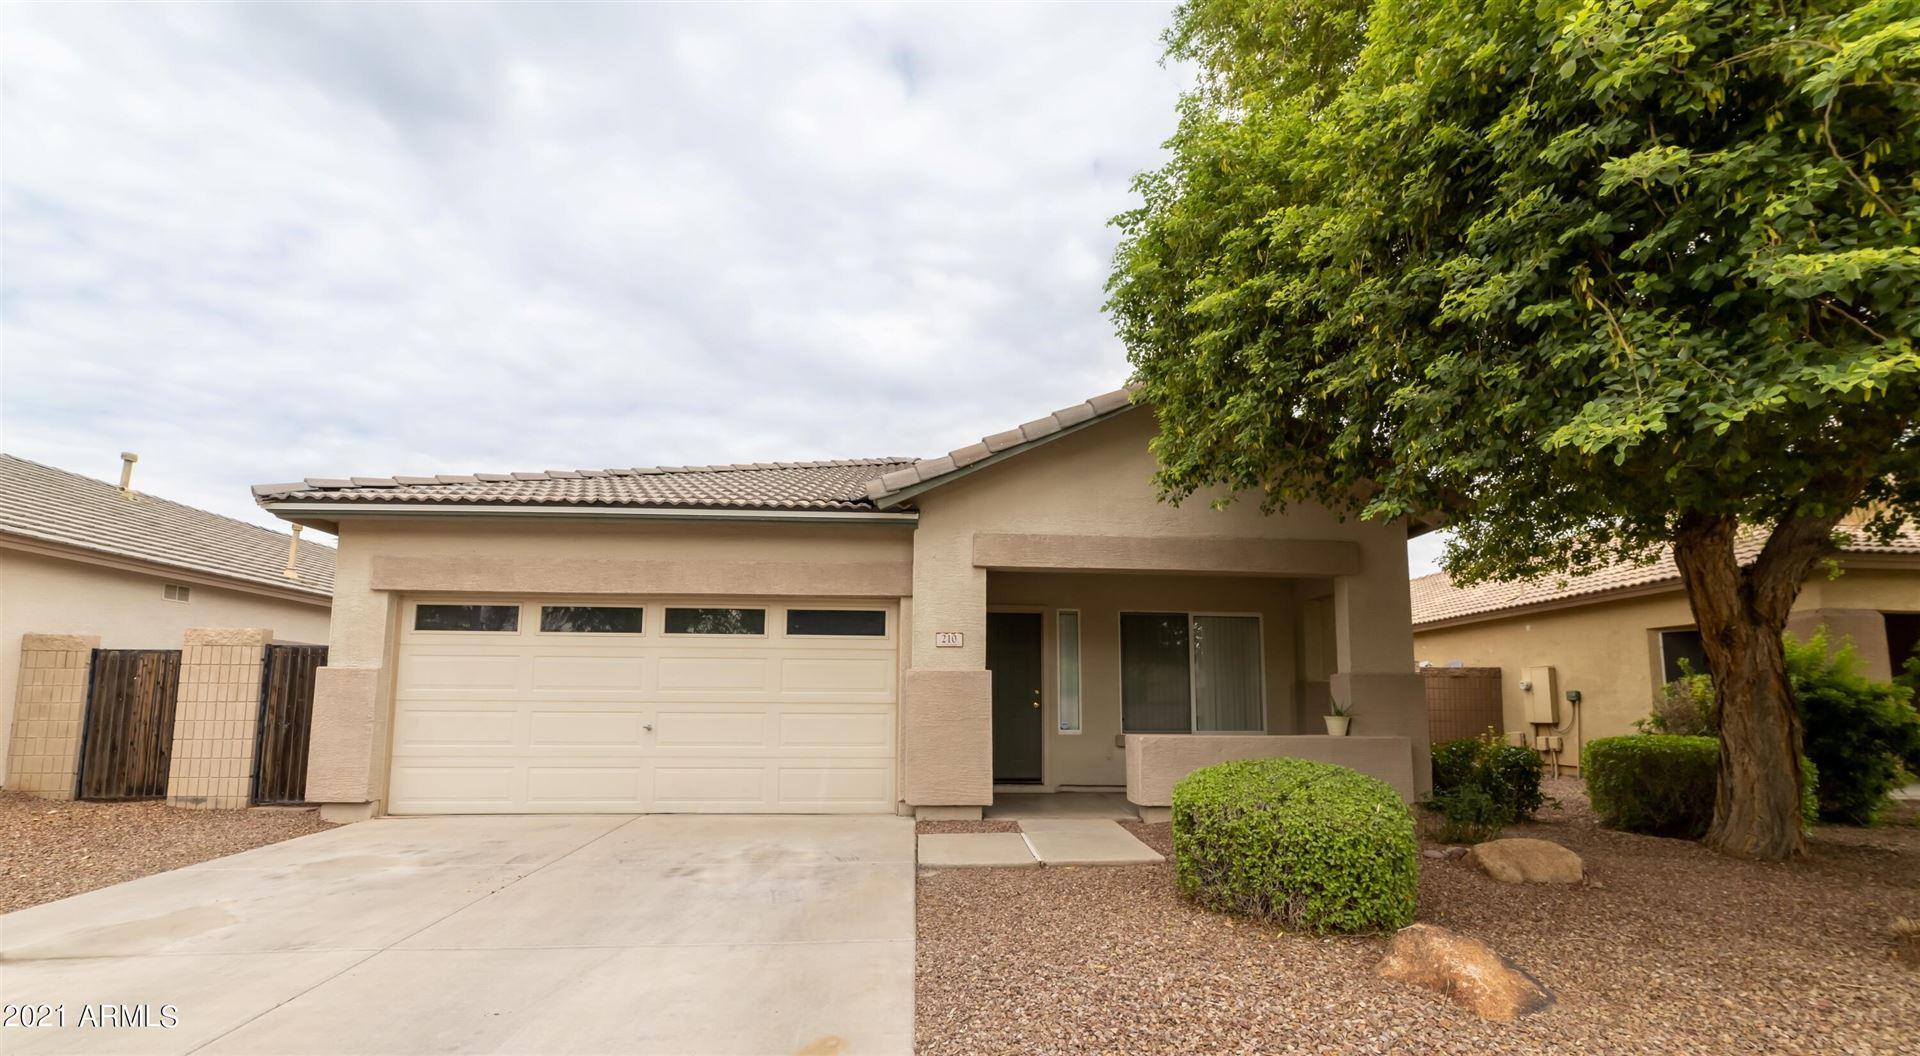 210 S 120TH Avenue, Avondale, AZ 85323 - MLS#: 6270546